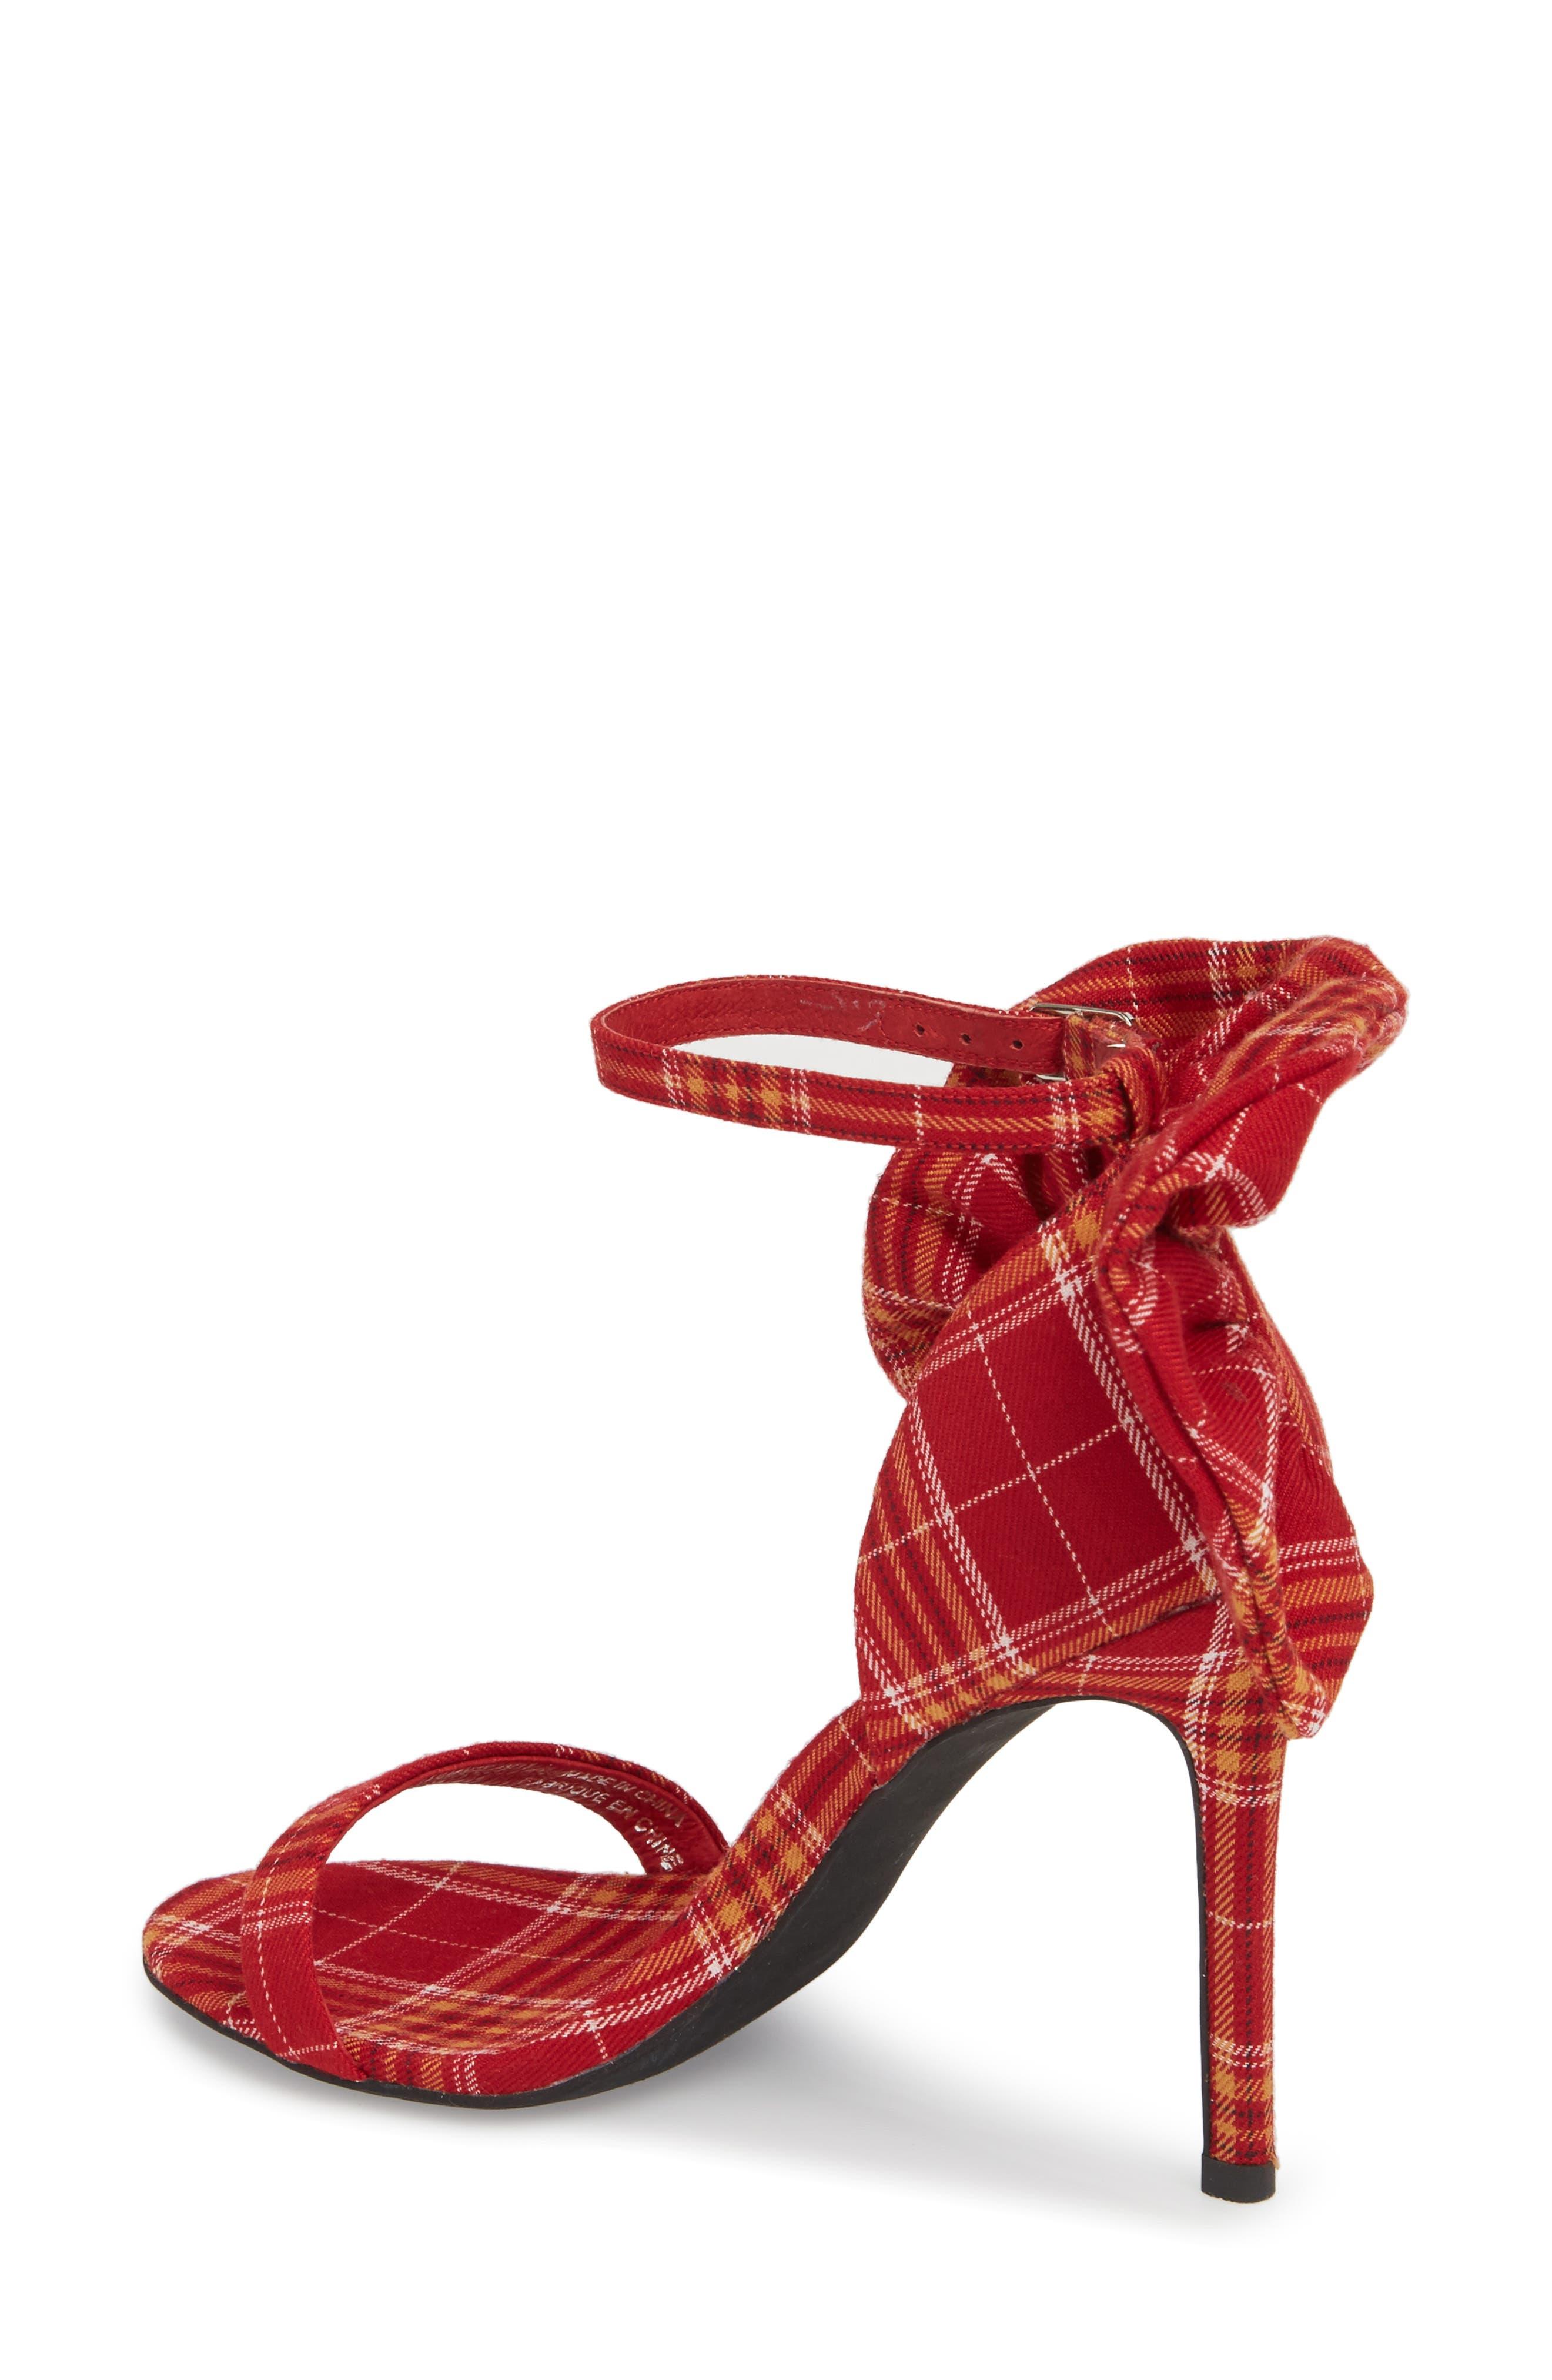 Cheshire Ruffle Sandal,                             Alternate thumbnail 2, color,                             Red Plaid Fabric